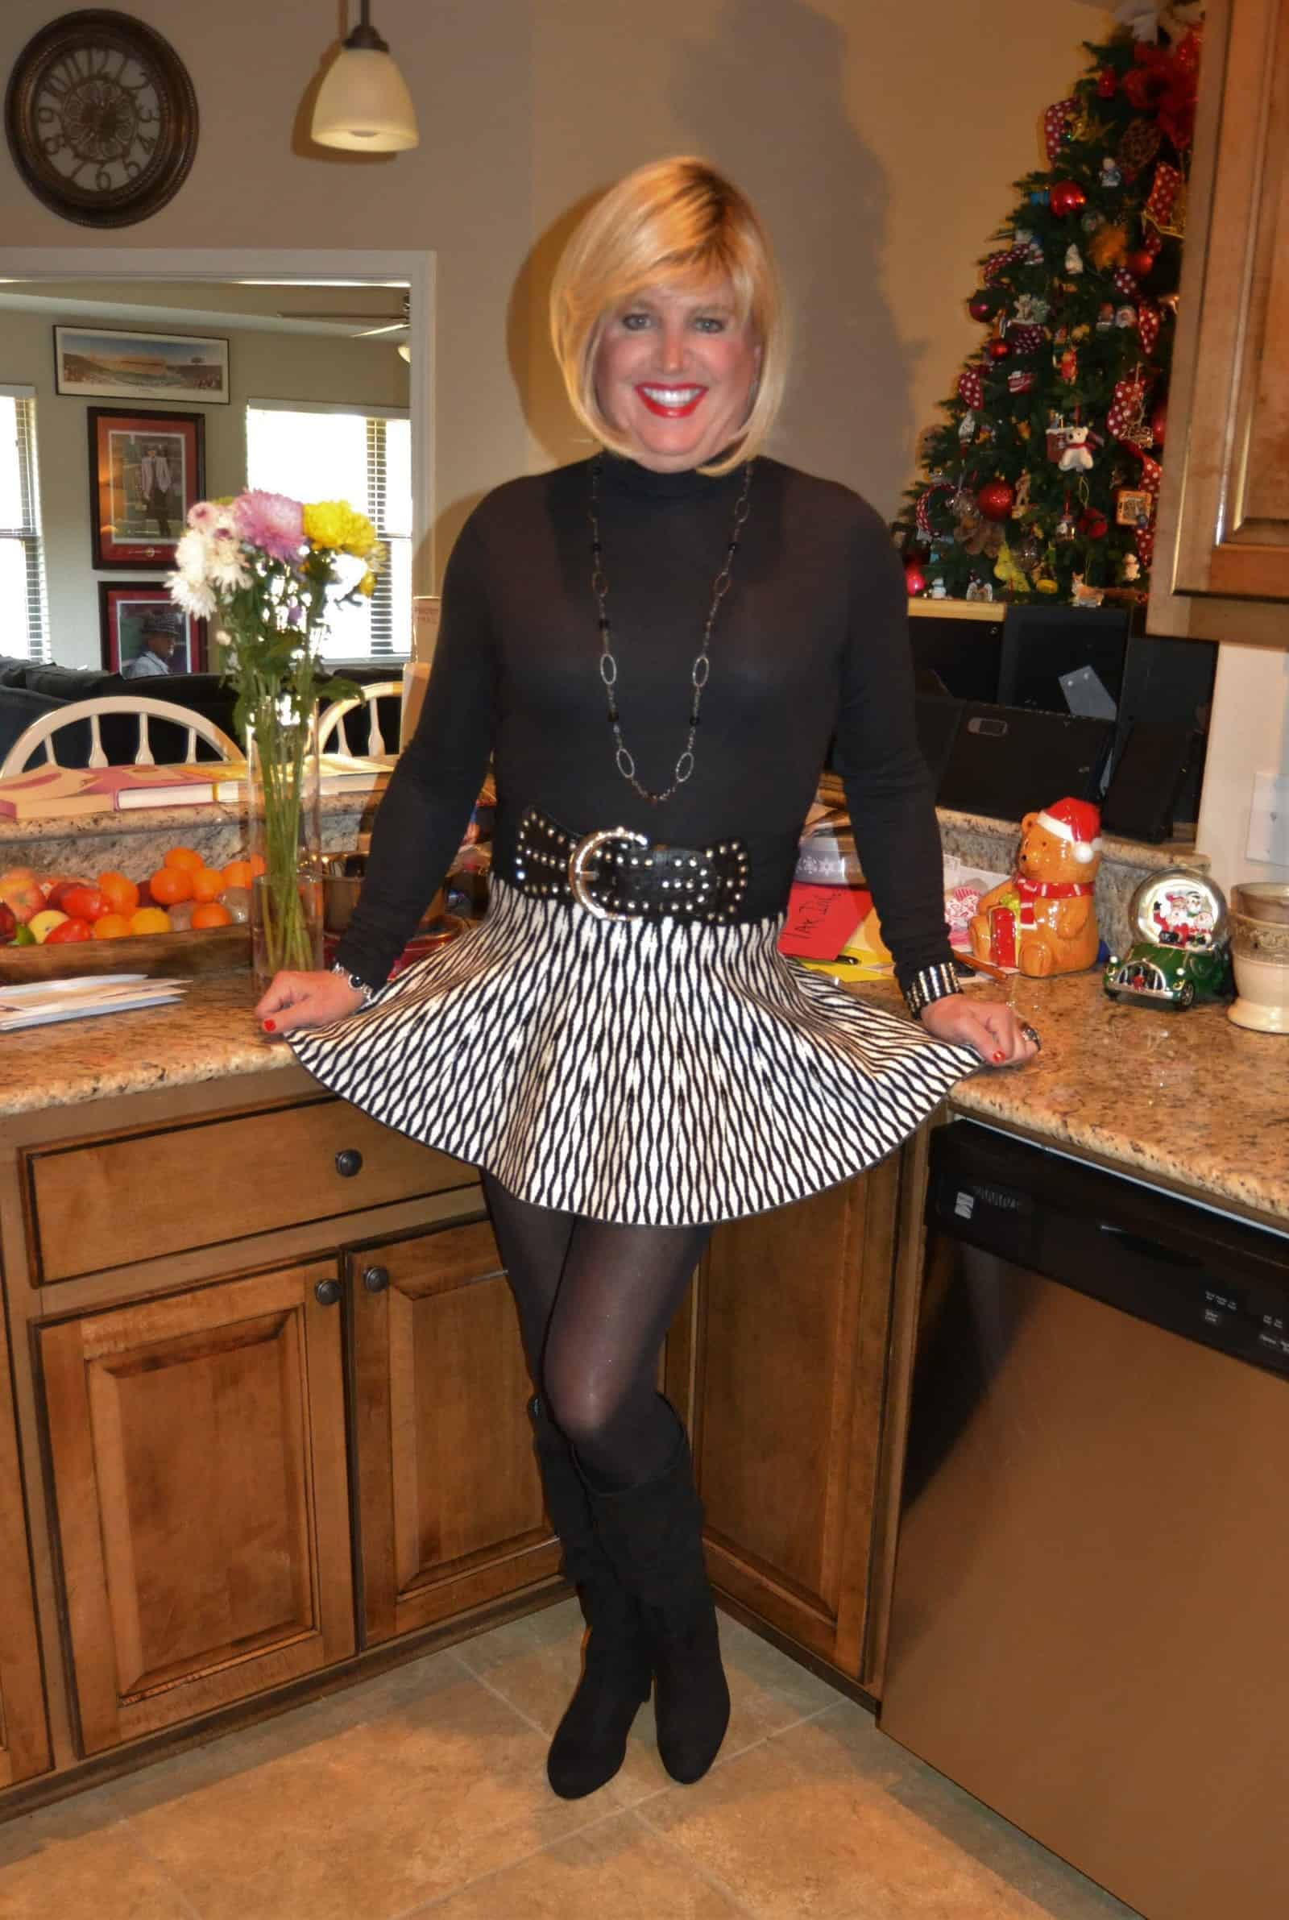 I Love Just A Classic Skater Skirt